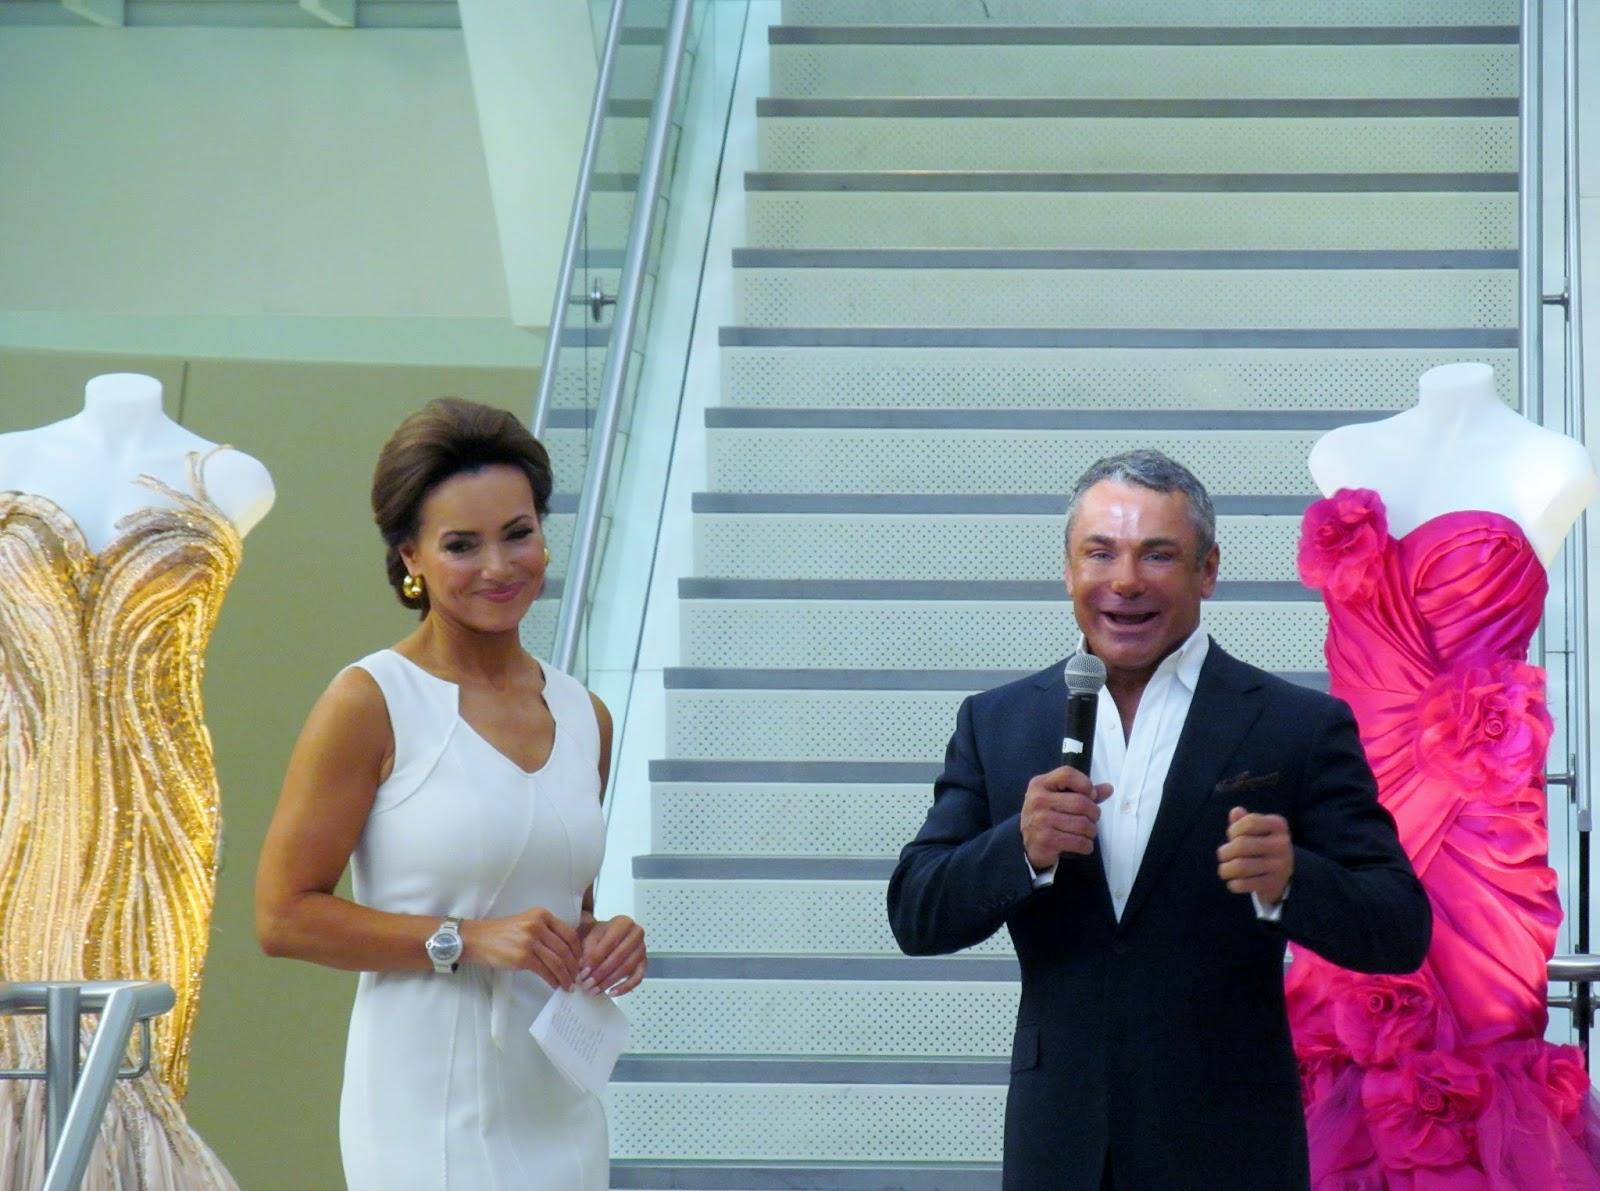 Lisa robertson in wedding dress - Lisa Robertson Qvc And Mark Zunino Designer